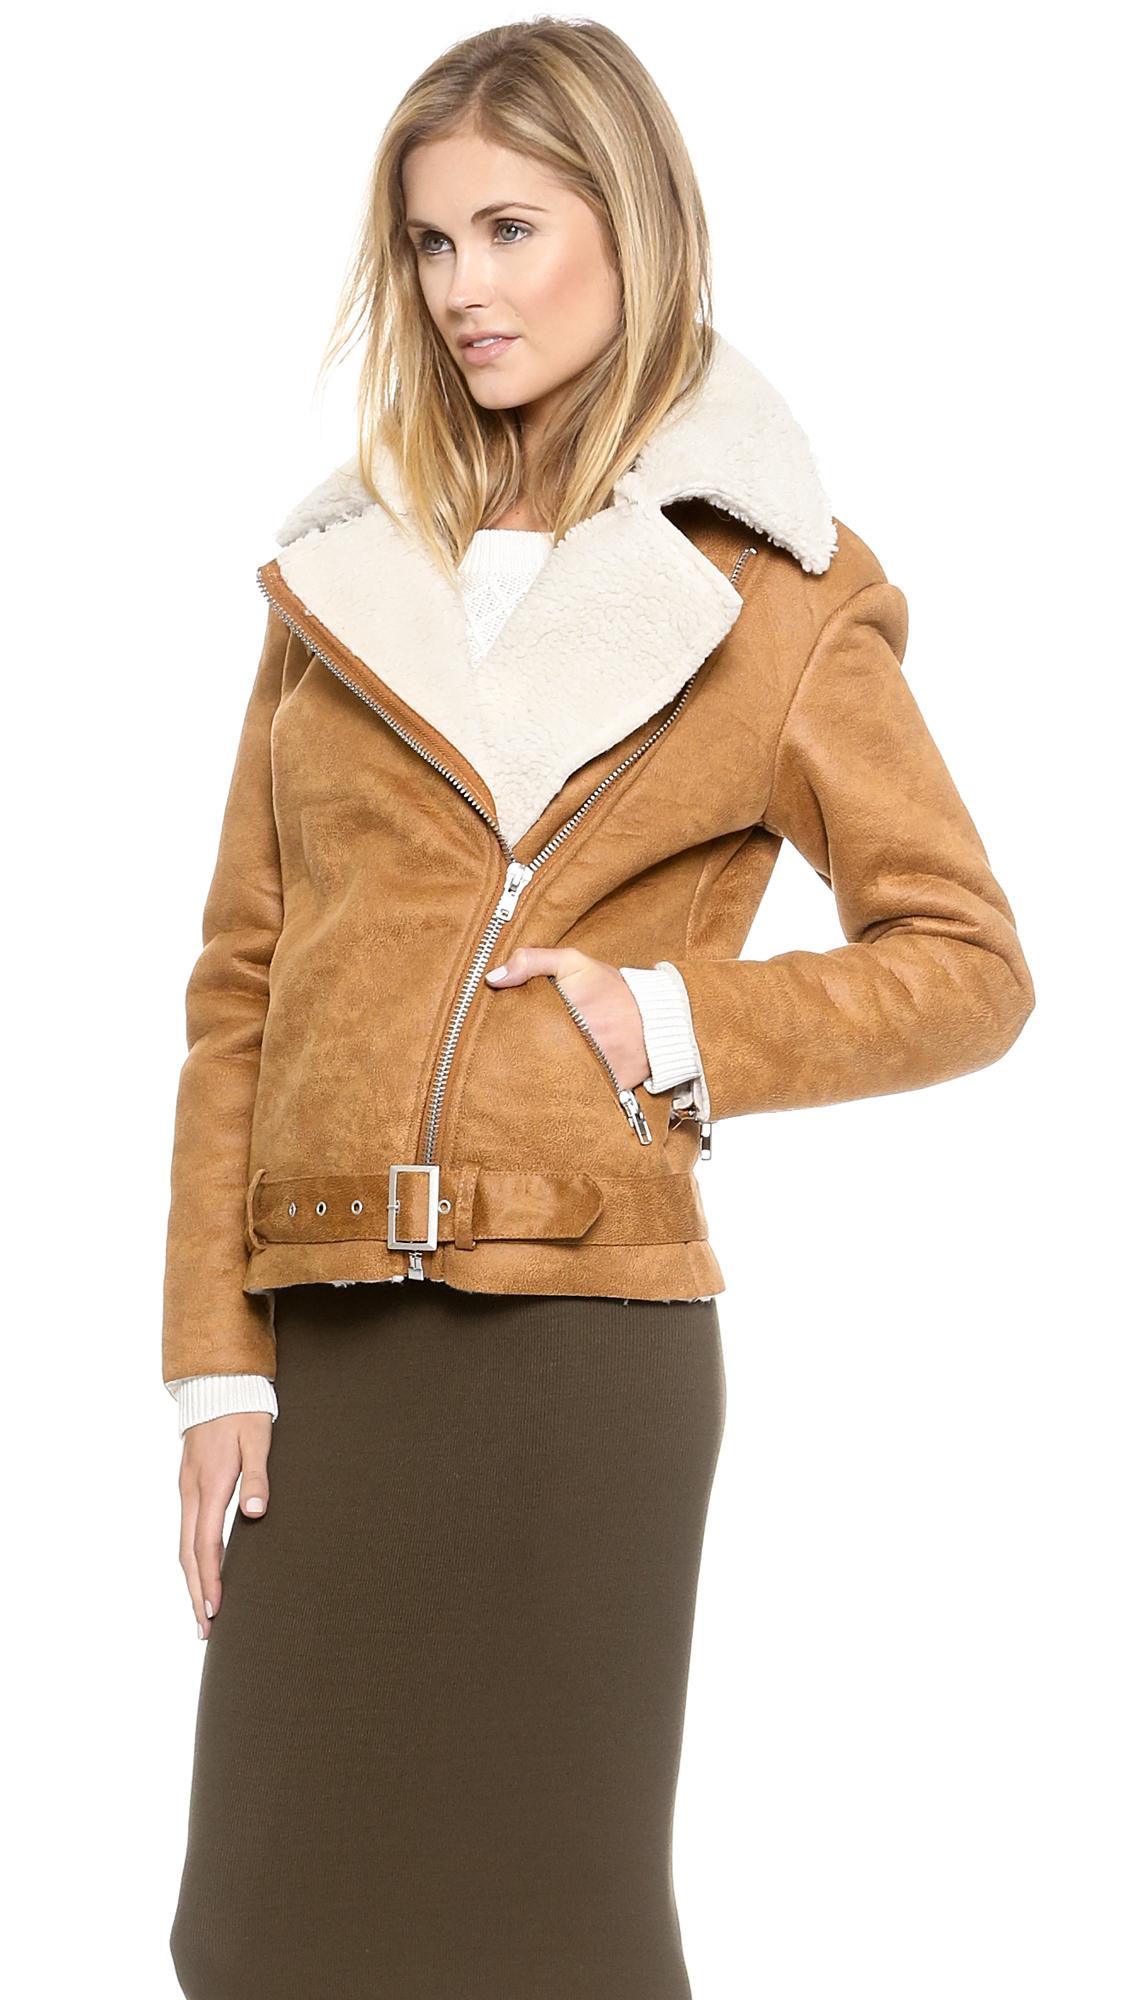 Tommy Hilfiger Women S Jacket